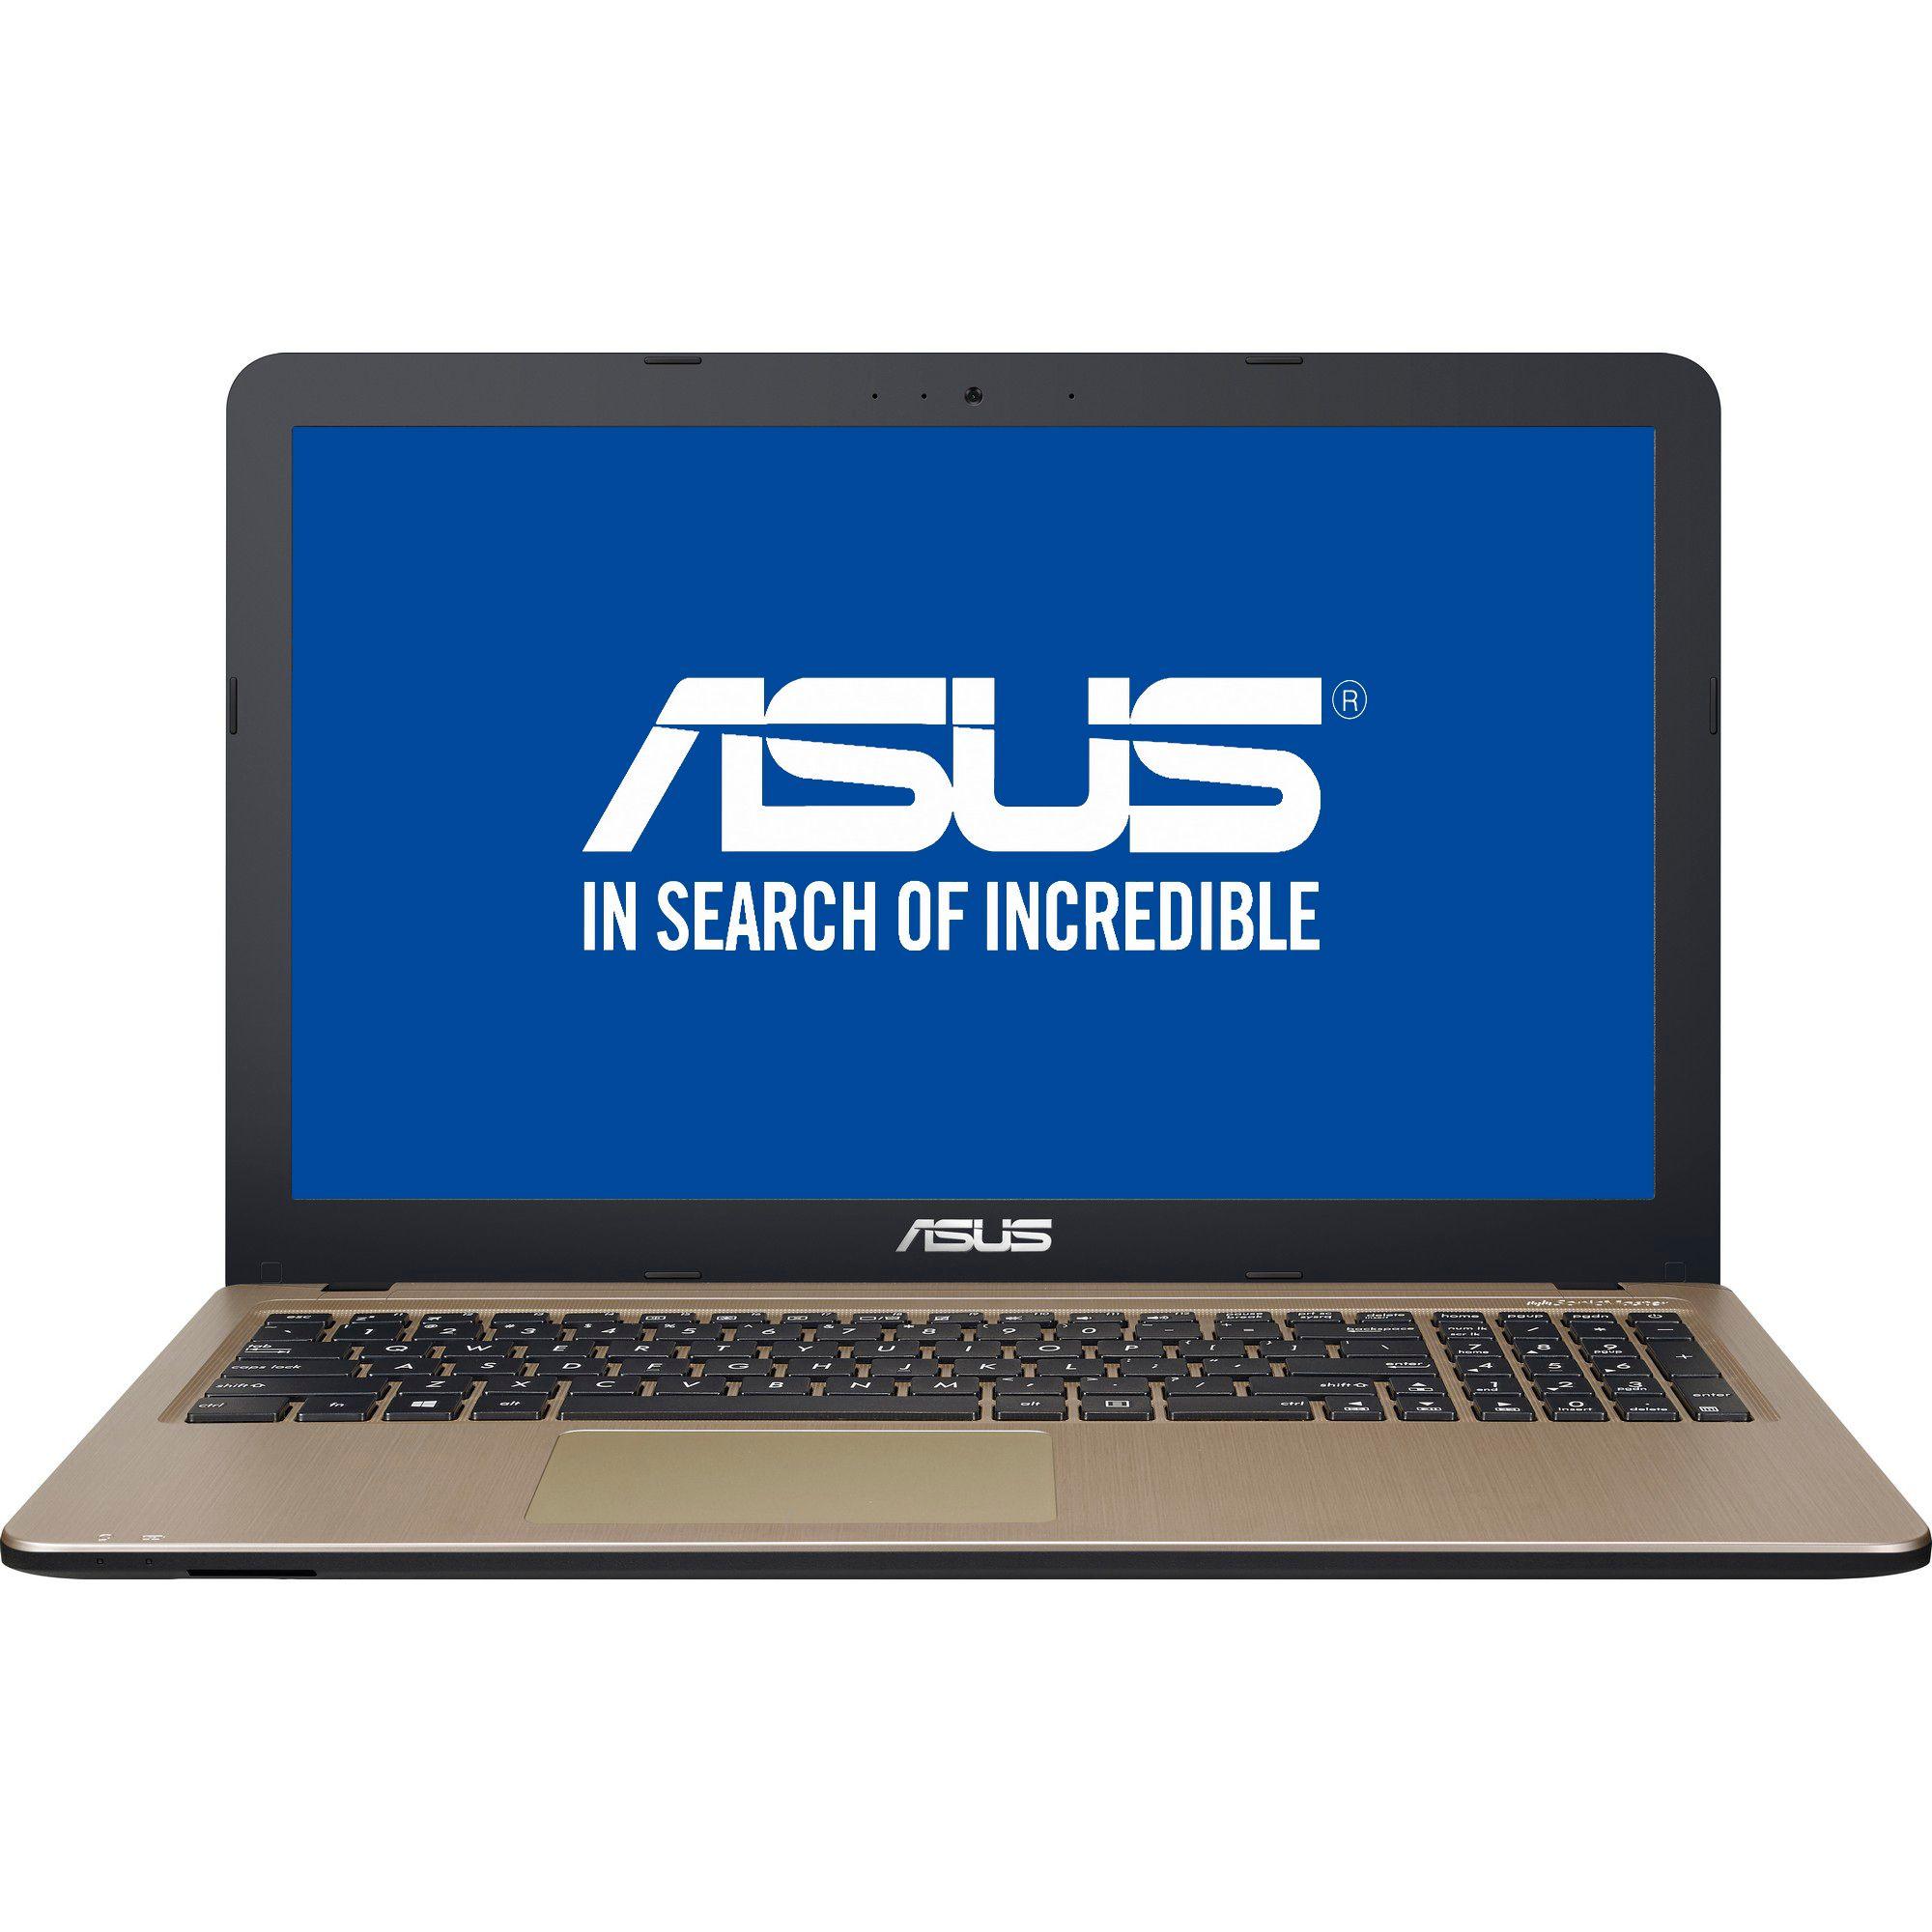 Notebook Asus VivoBook X540UA 15.6 Full HD Intel Core i3-7020U RAM 4GB HDD 1TB Endless Negru